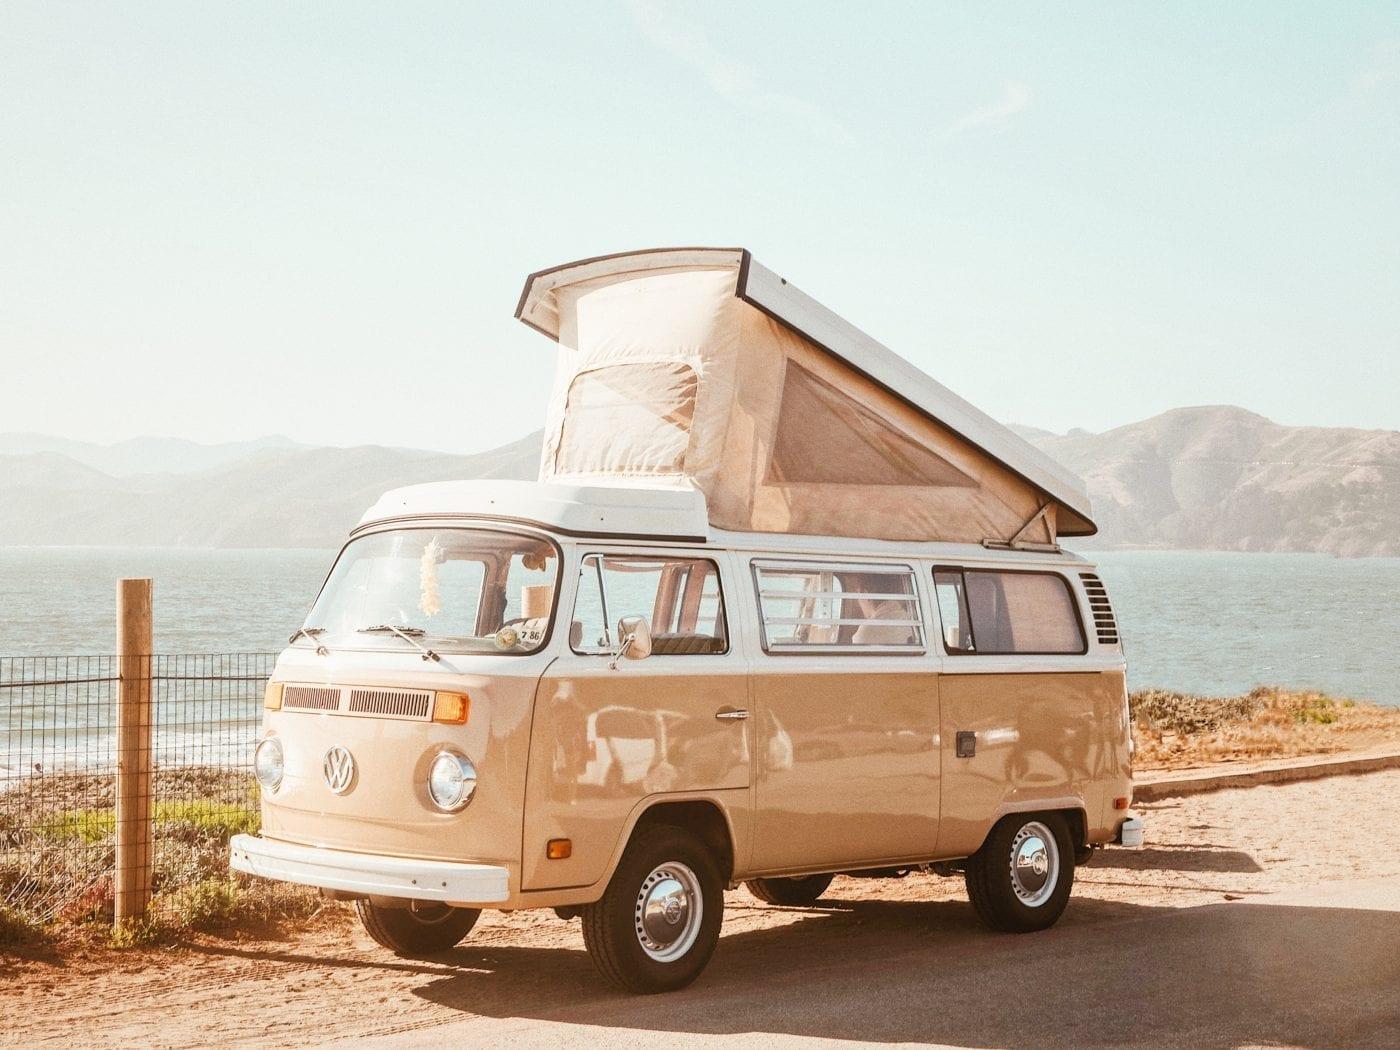 Caravan storage in Cardiff - we want your feedback!